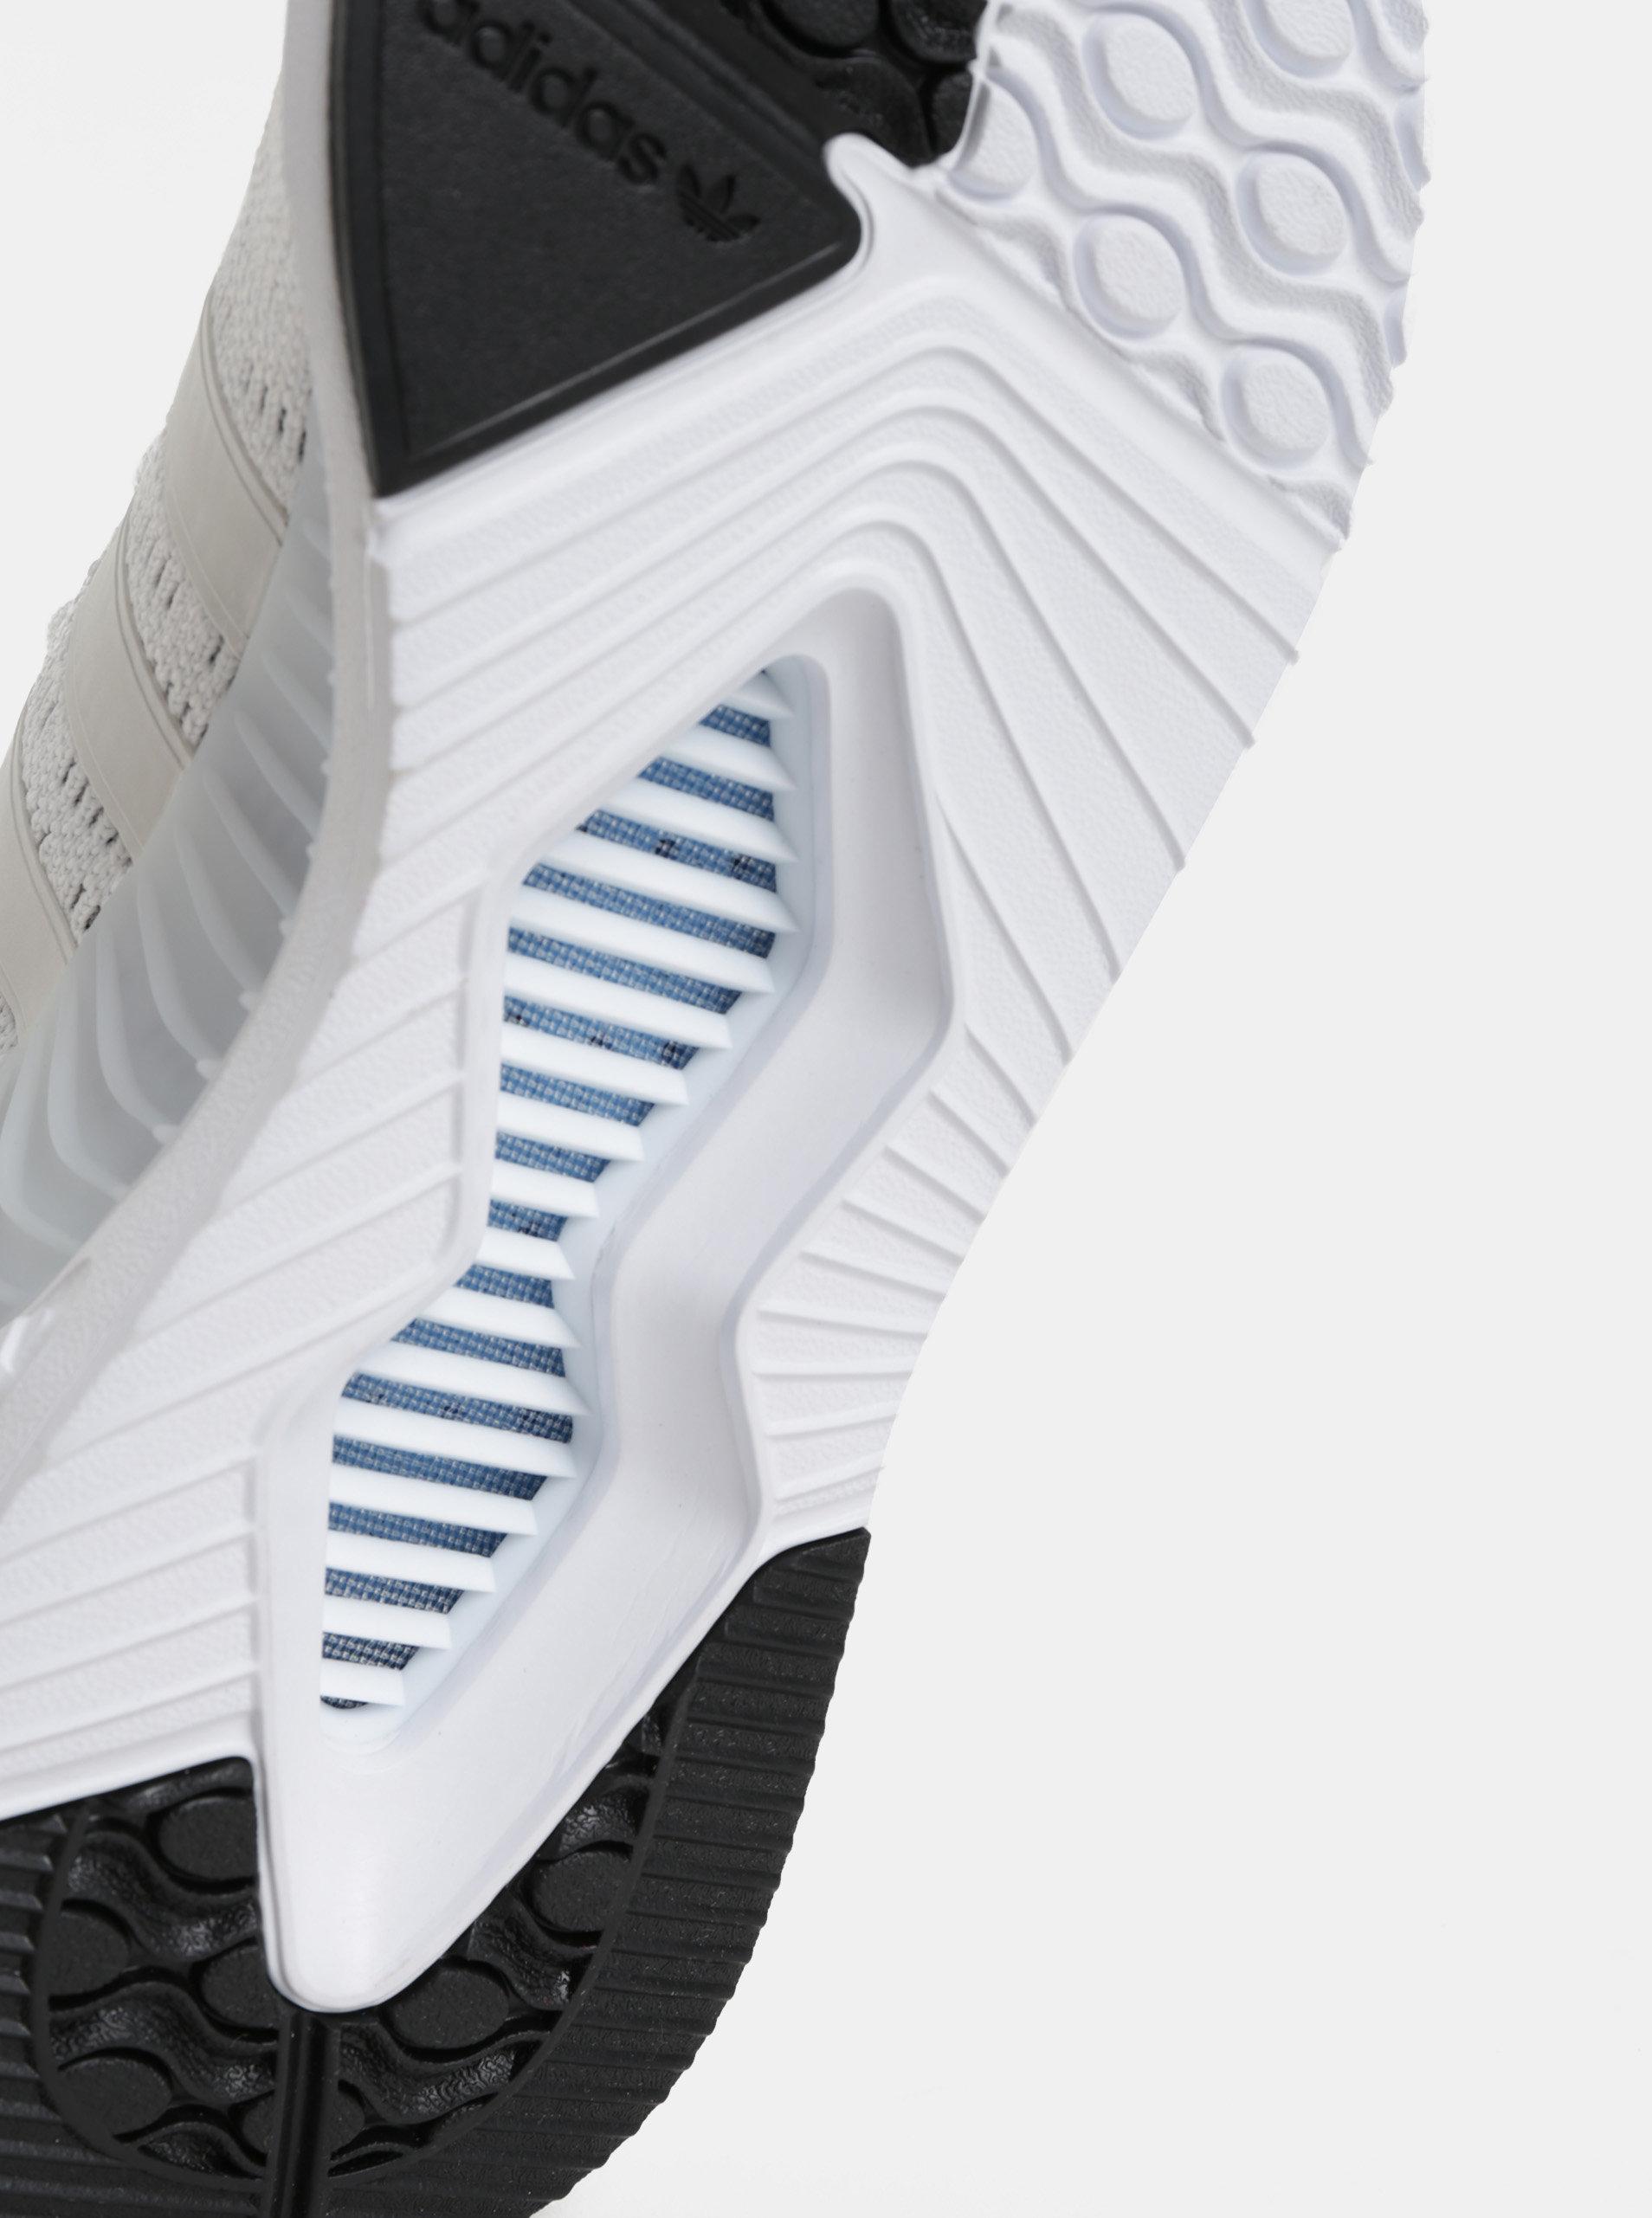 Bílé pánské tenisky adidas Originals Climacool 02 17 PK ... 931be9f6202